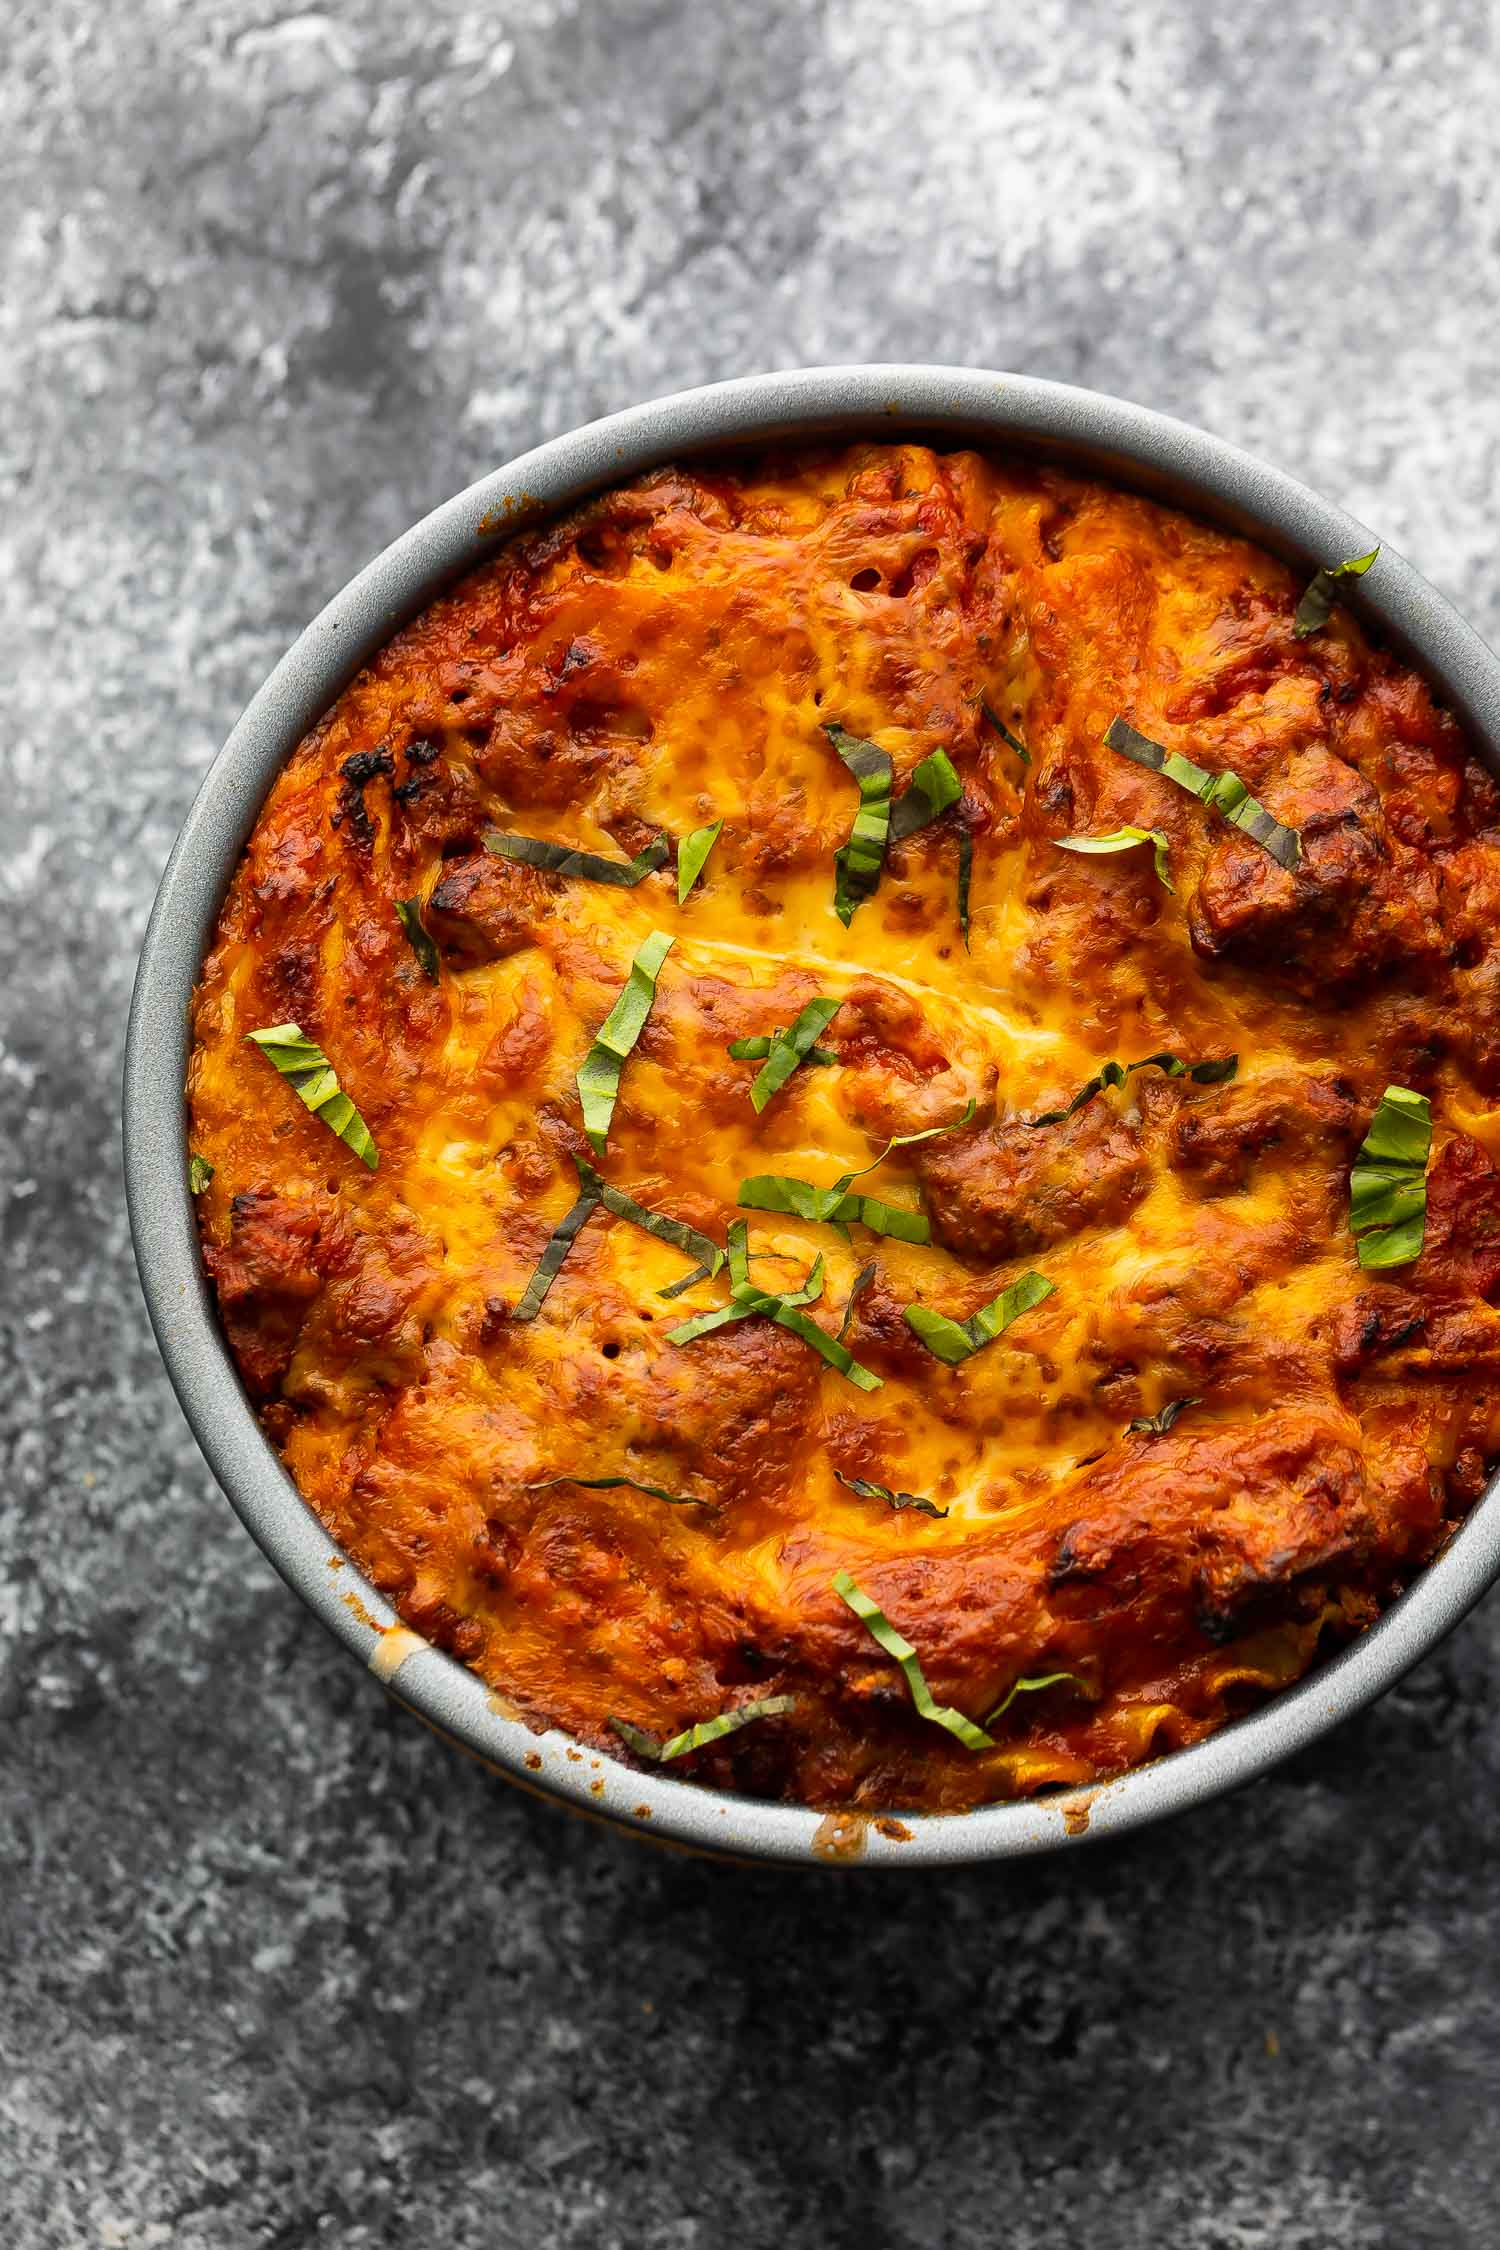 cooked lasagna in round cake pan